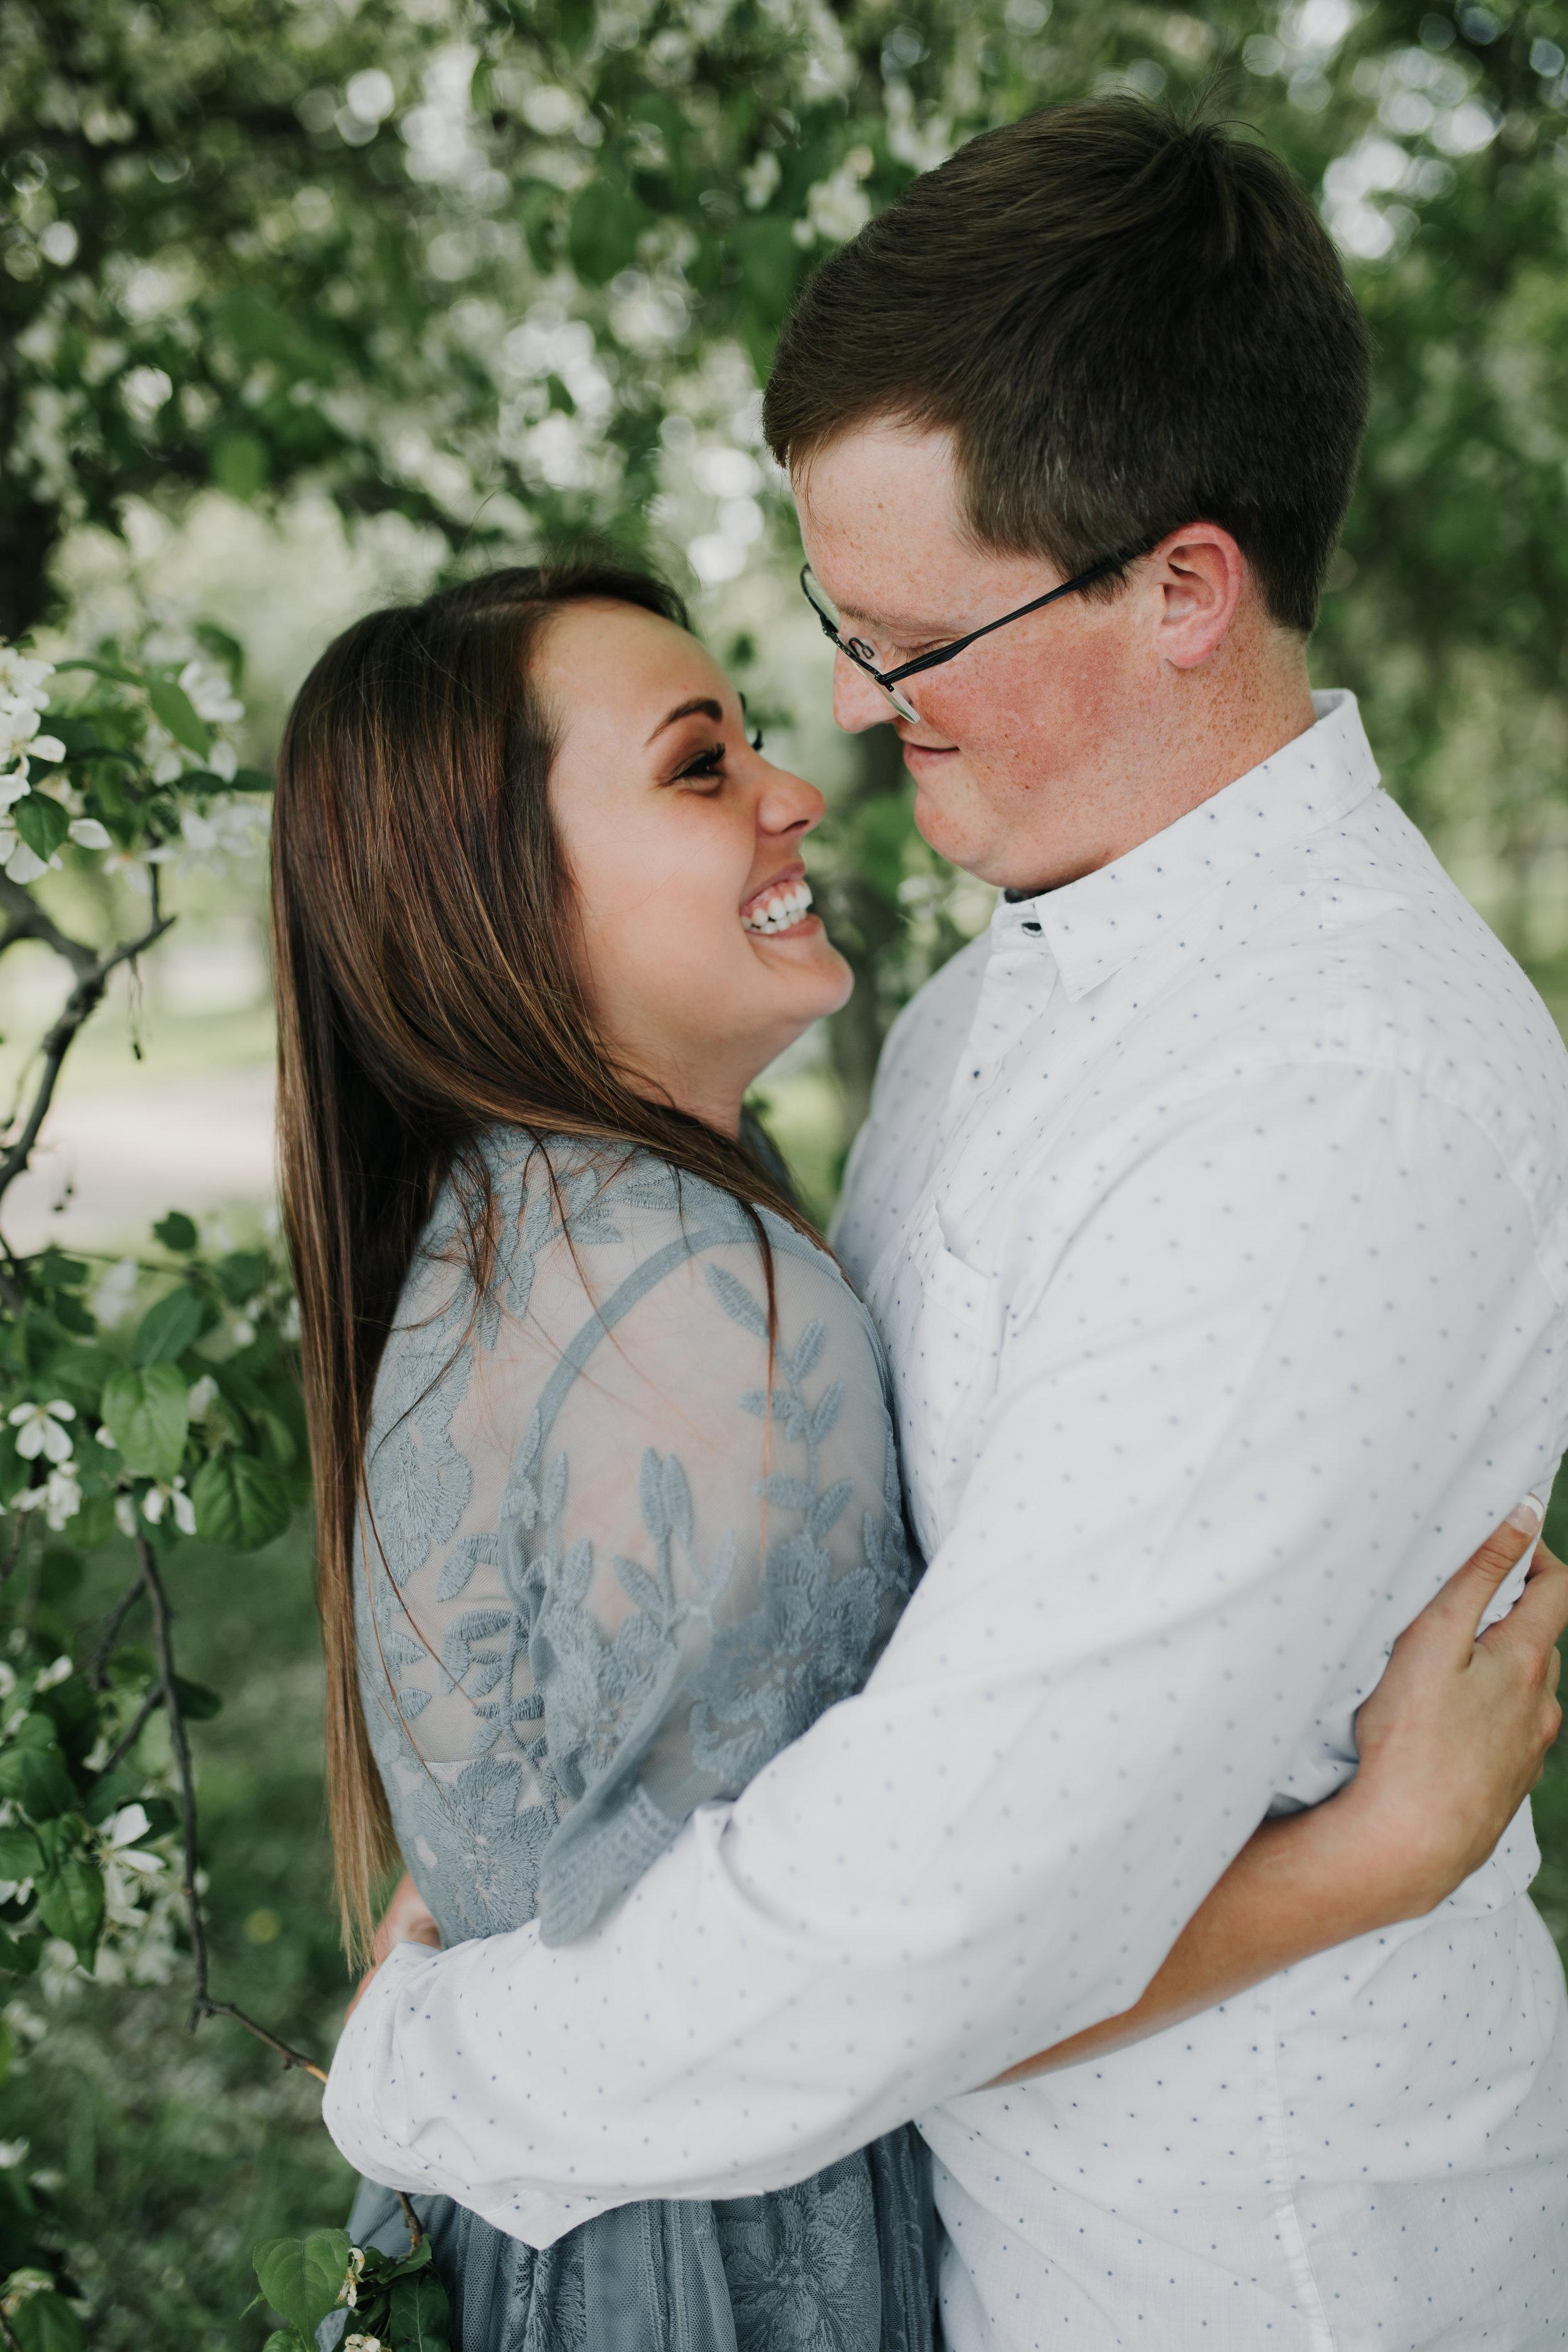 Carlie & Brandt - Engaged - Nathaniel Jensen Photography-16.jpg